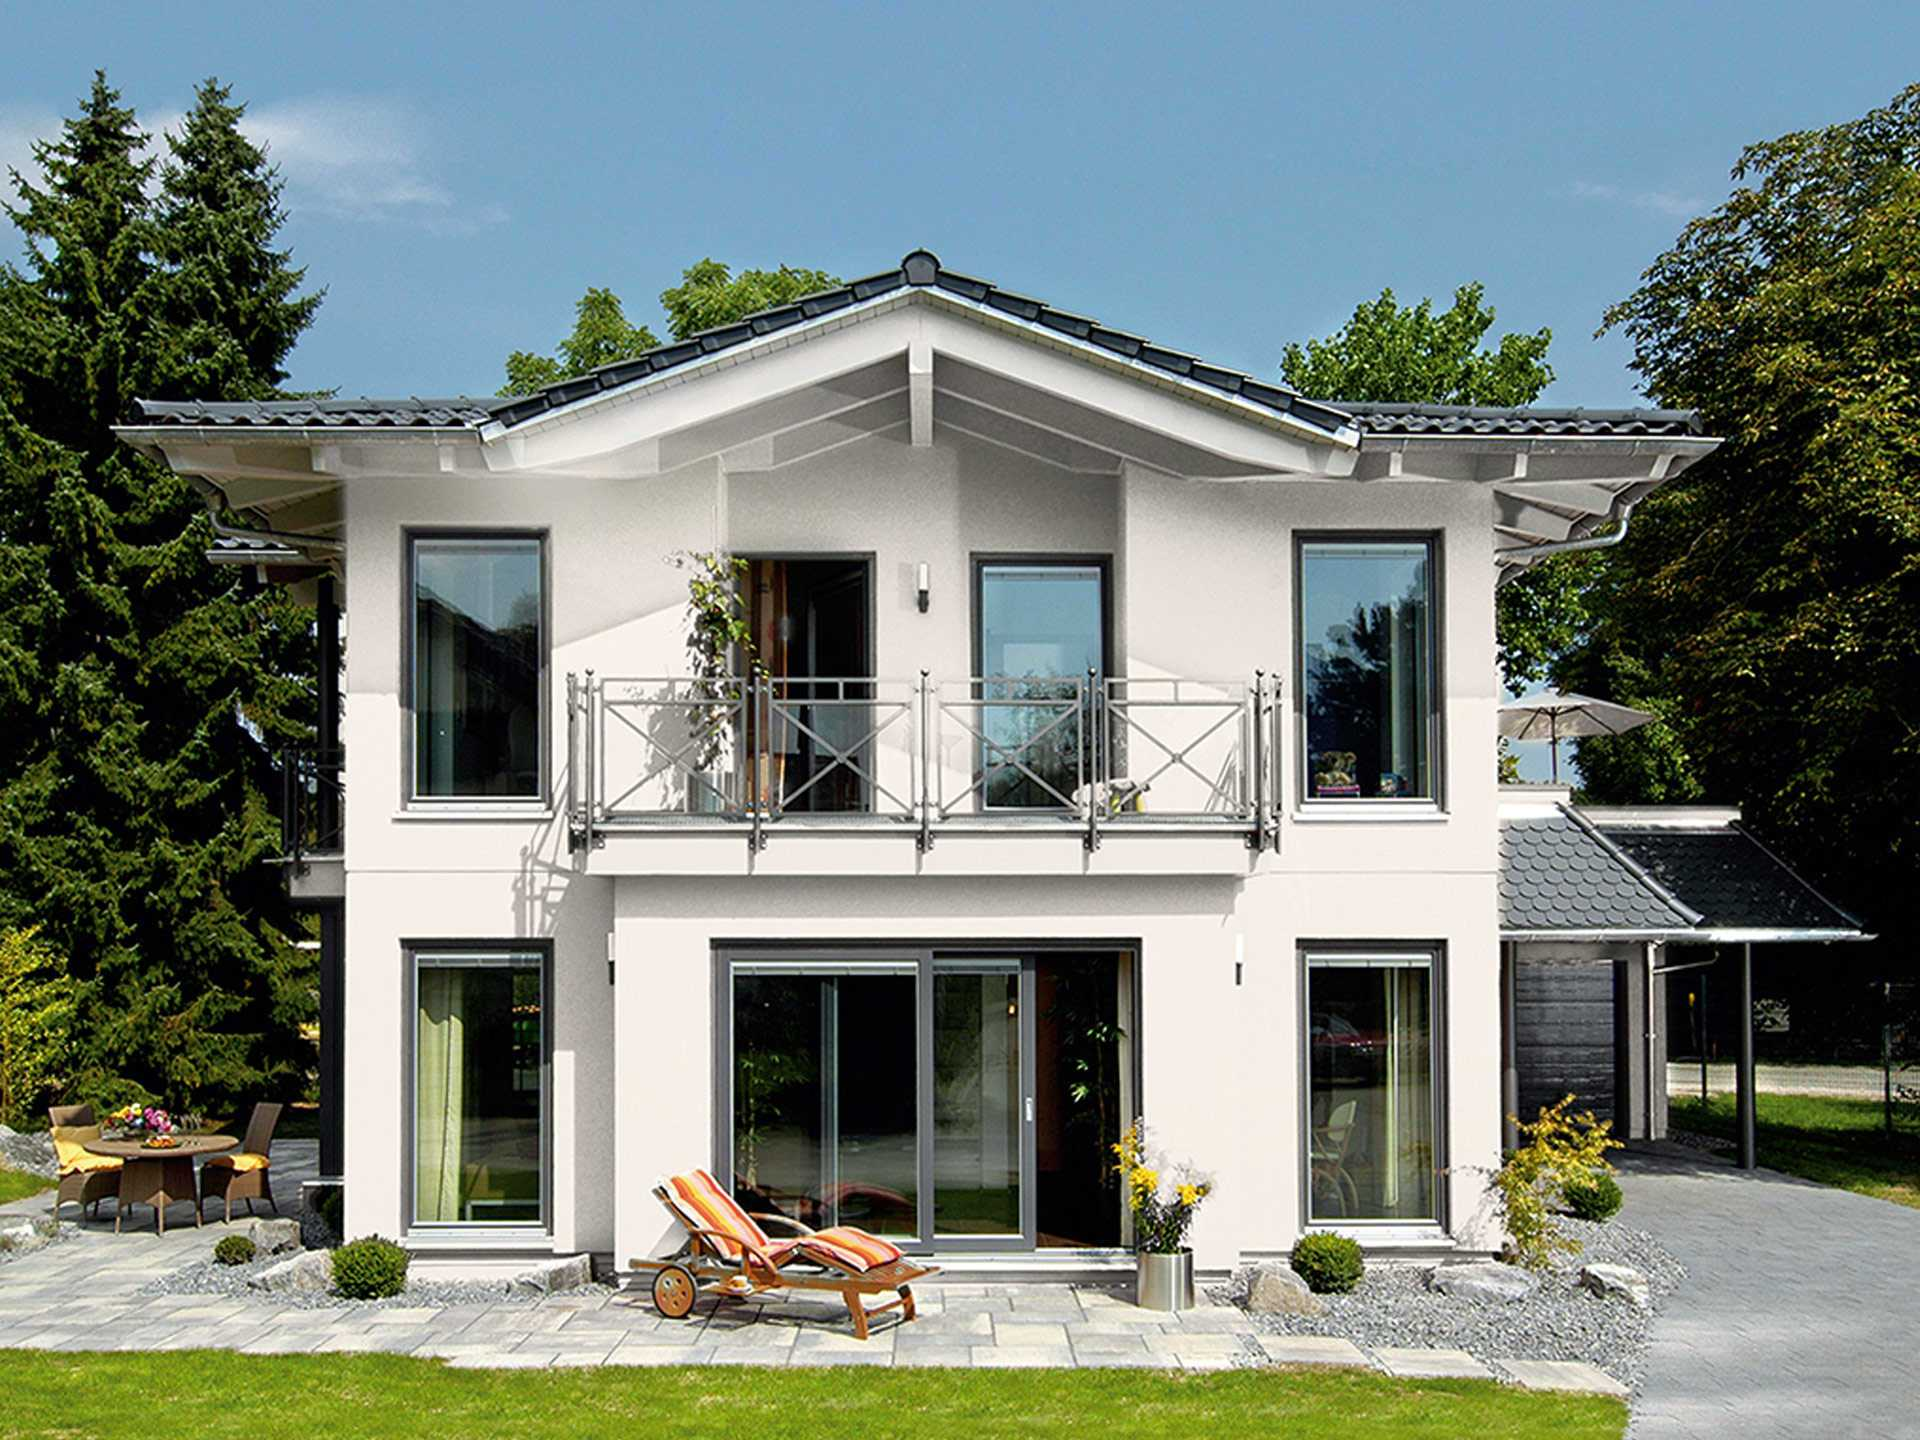 Hausbau center ulm des bdf e v for Fertighaus grundrisse einfamilienhaus